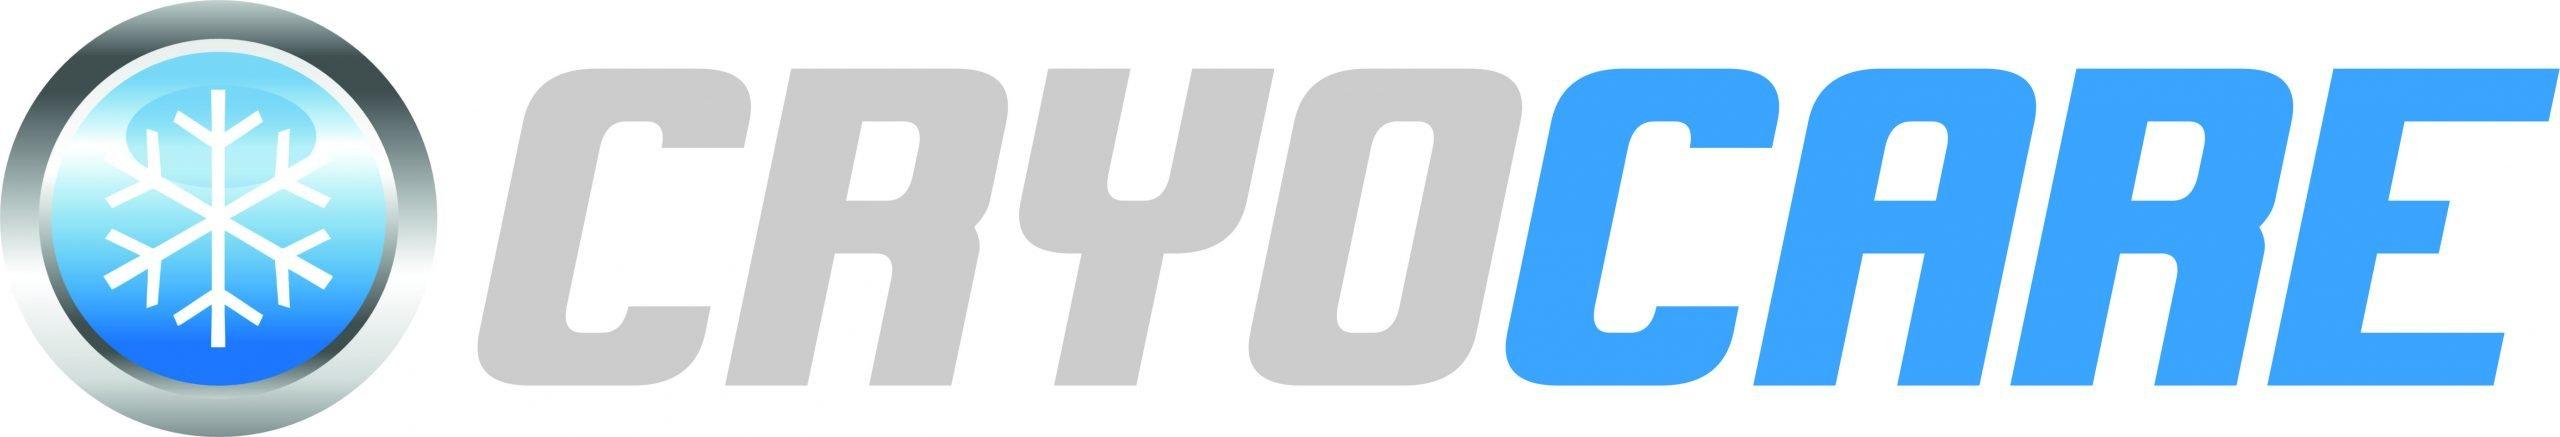 Cryocare logo